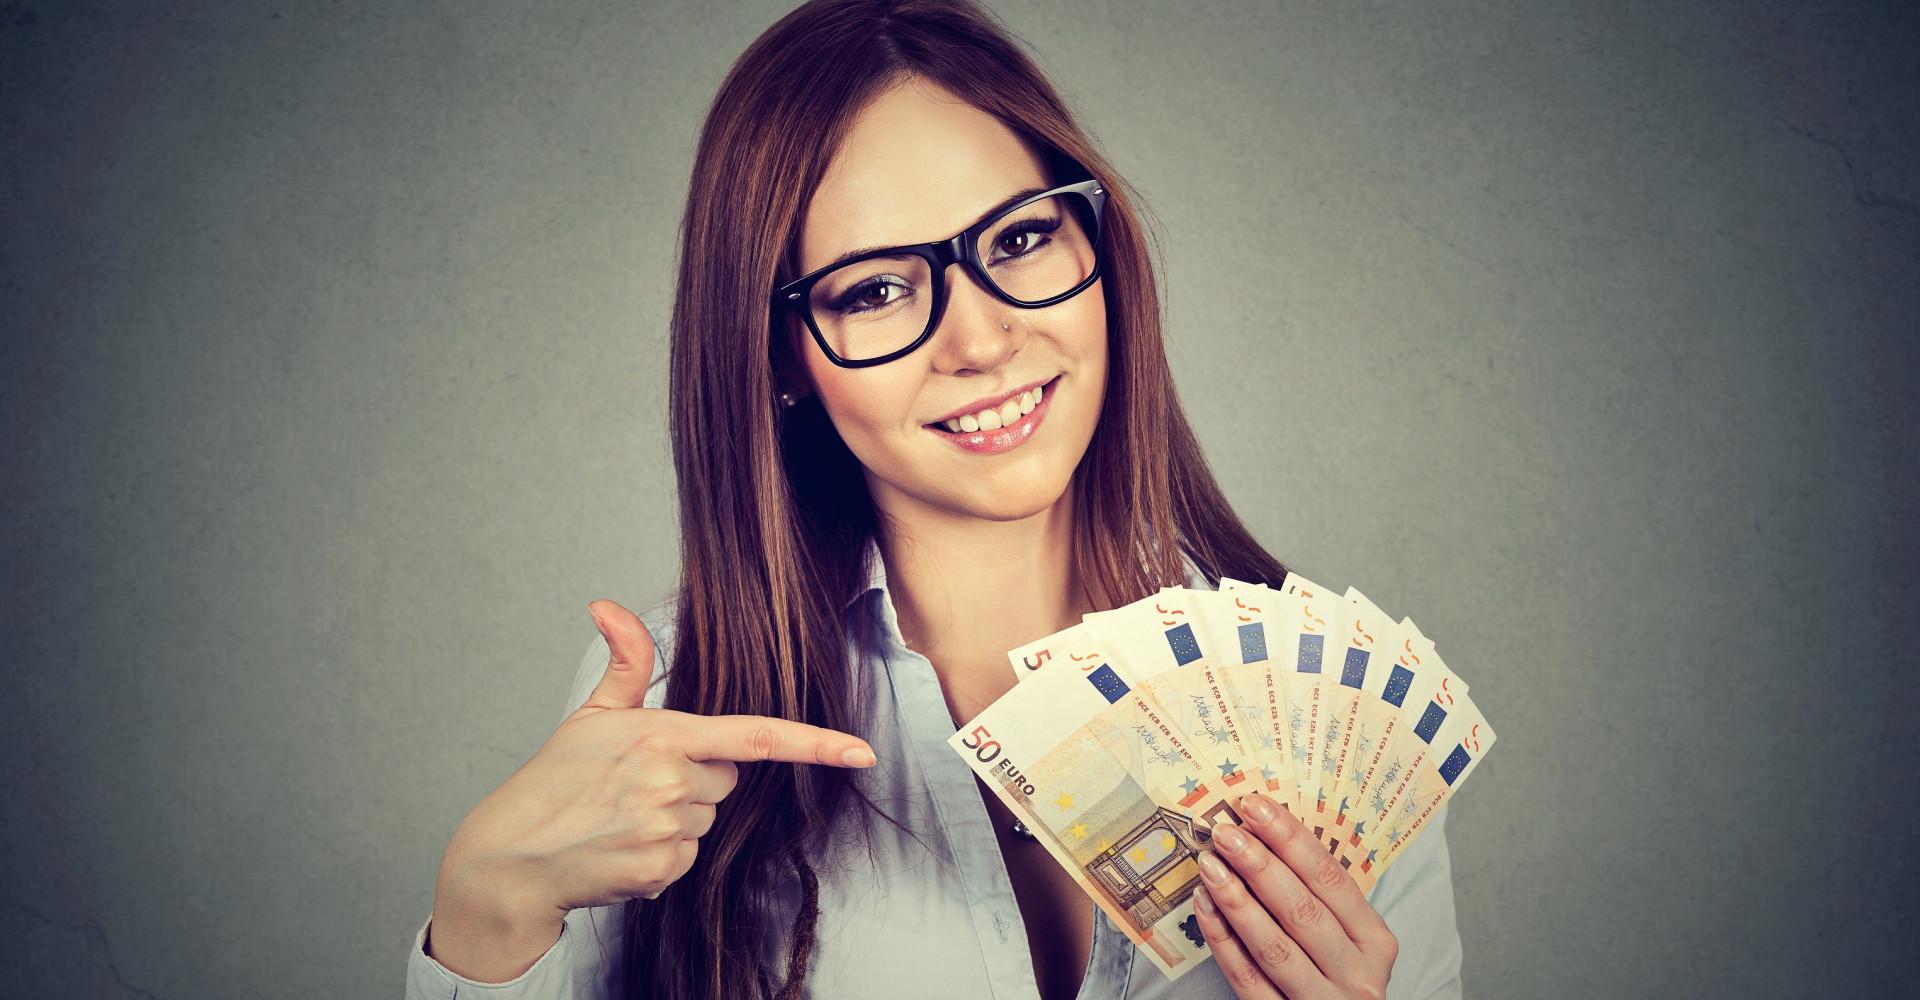 Loterijwinnares biedt 70.000 euro per jaar voor full-time partner